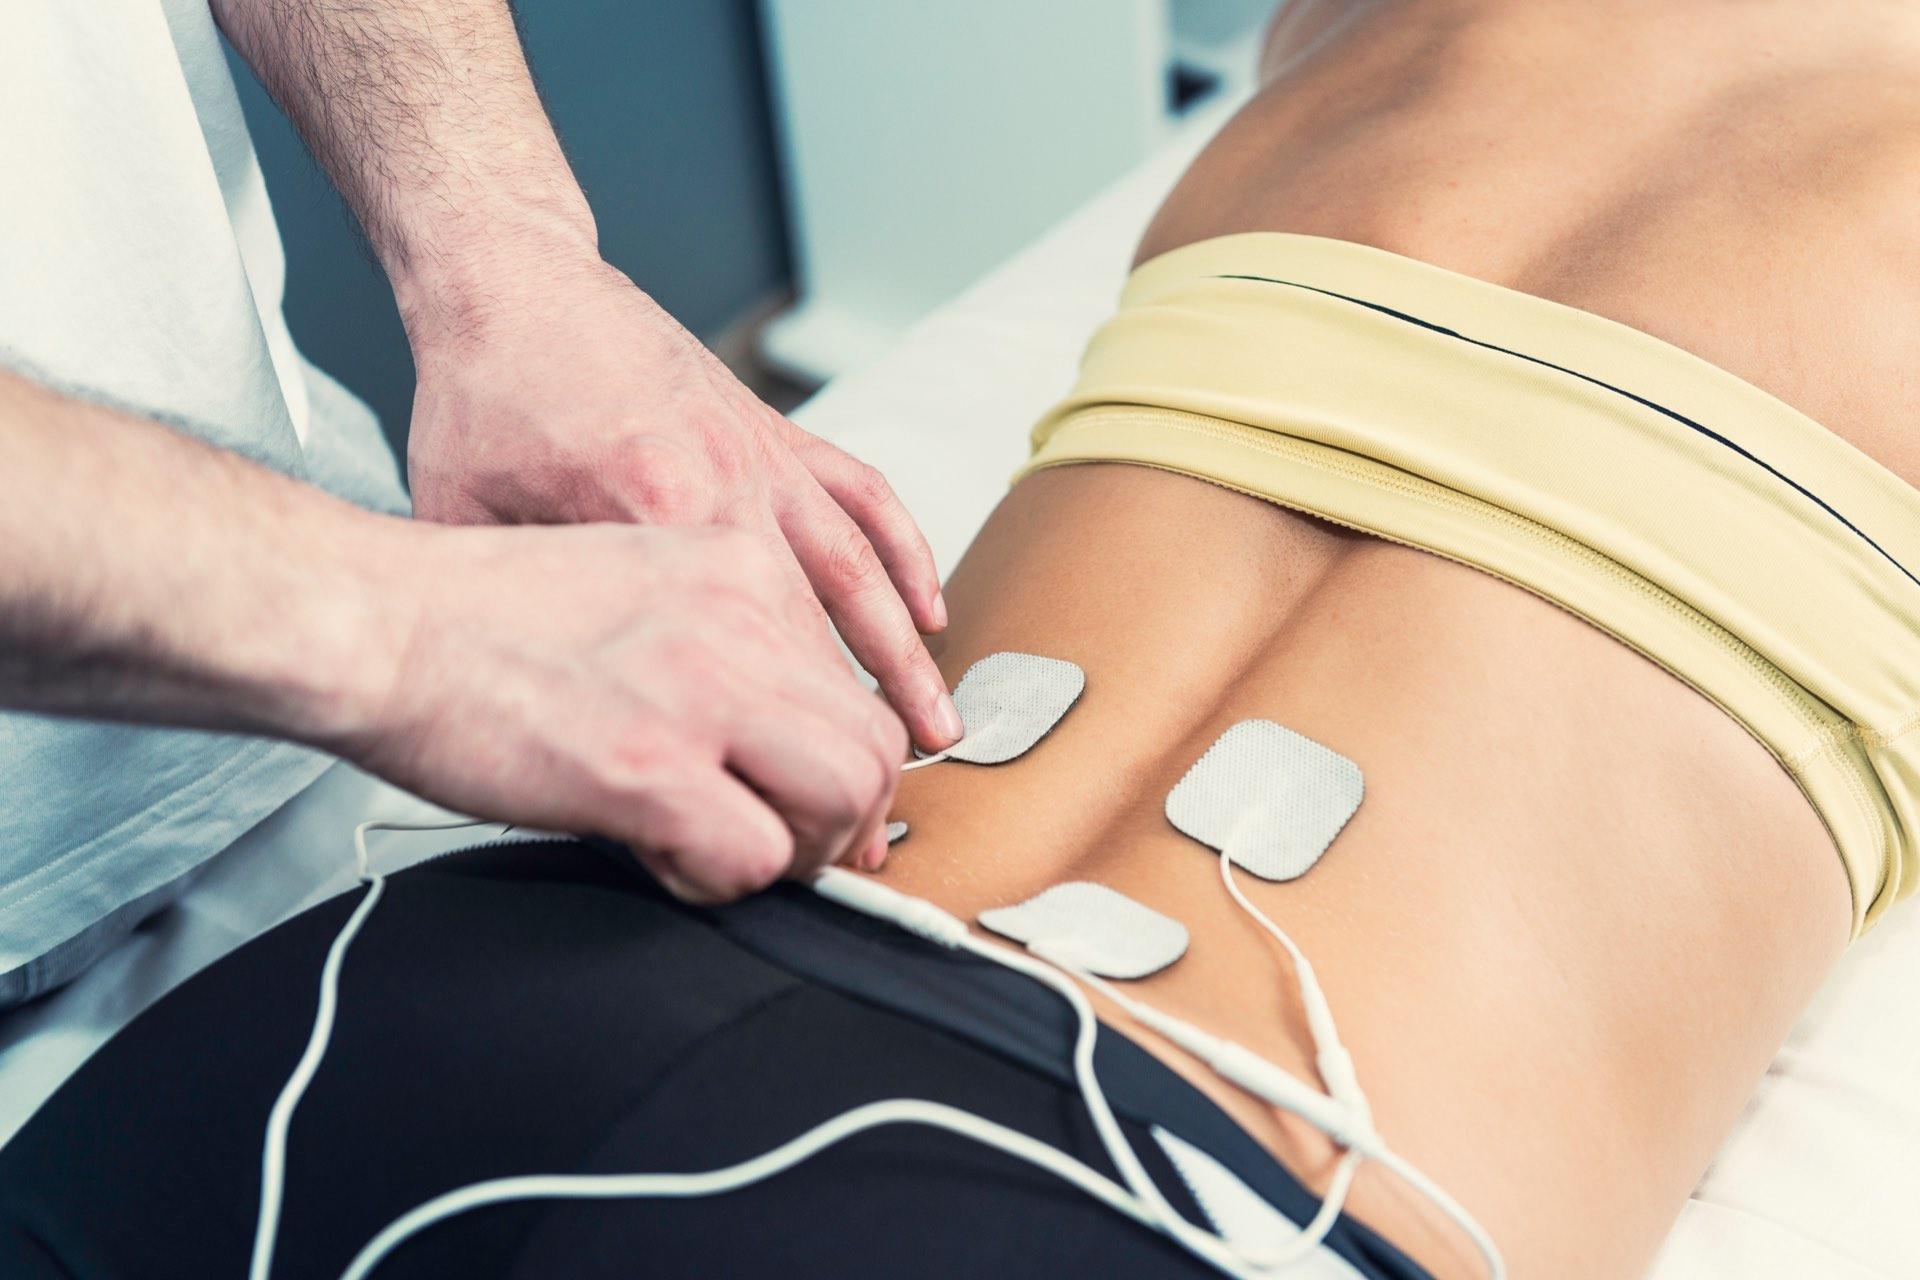 Bioelektrsiche Impulse am Rücken